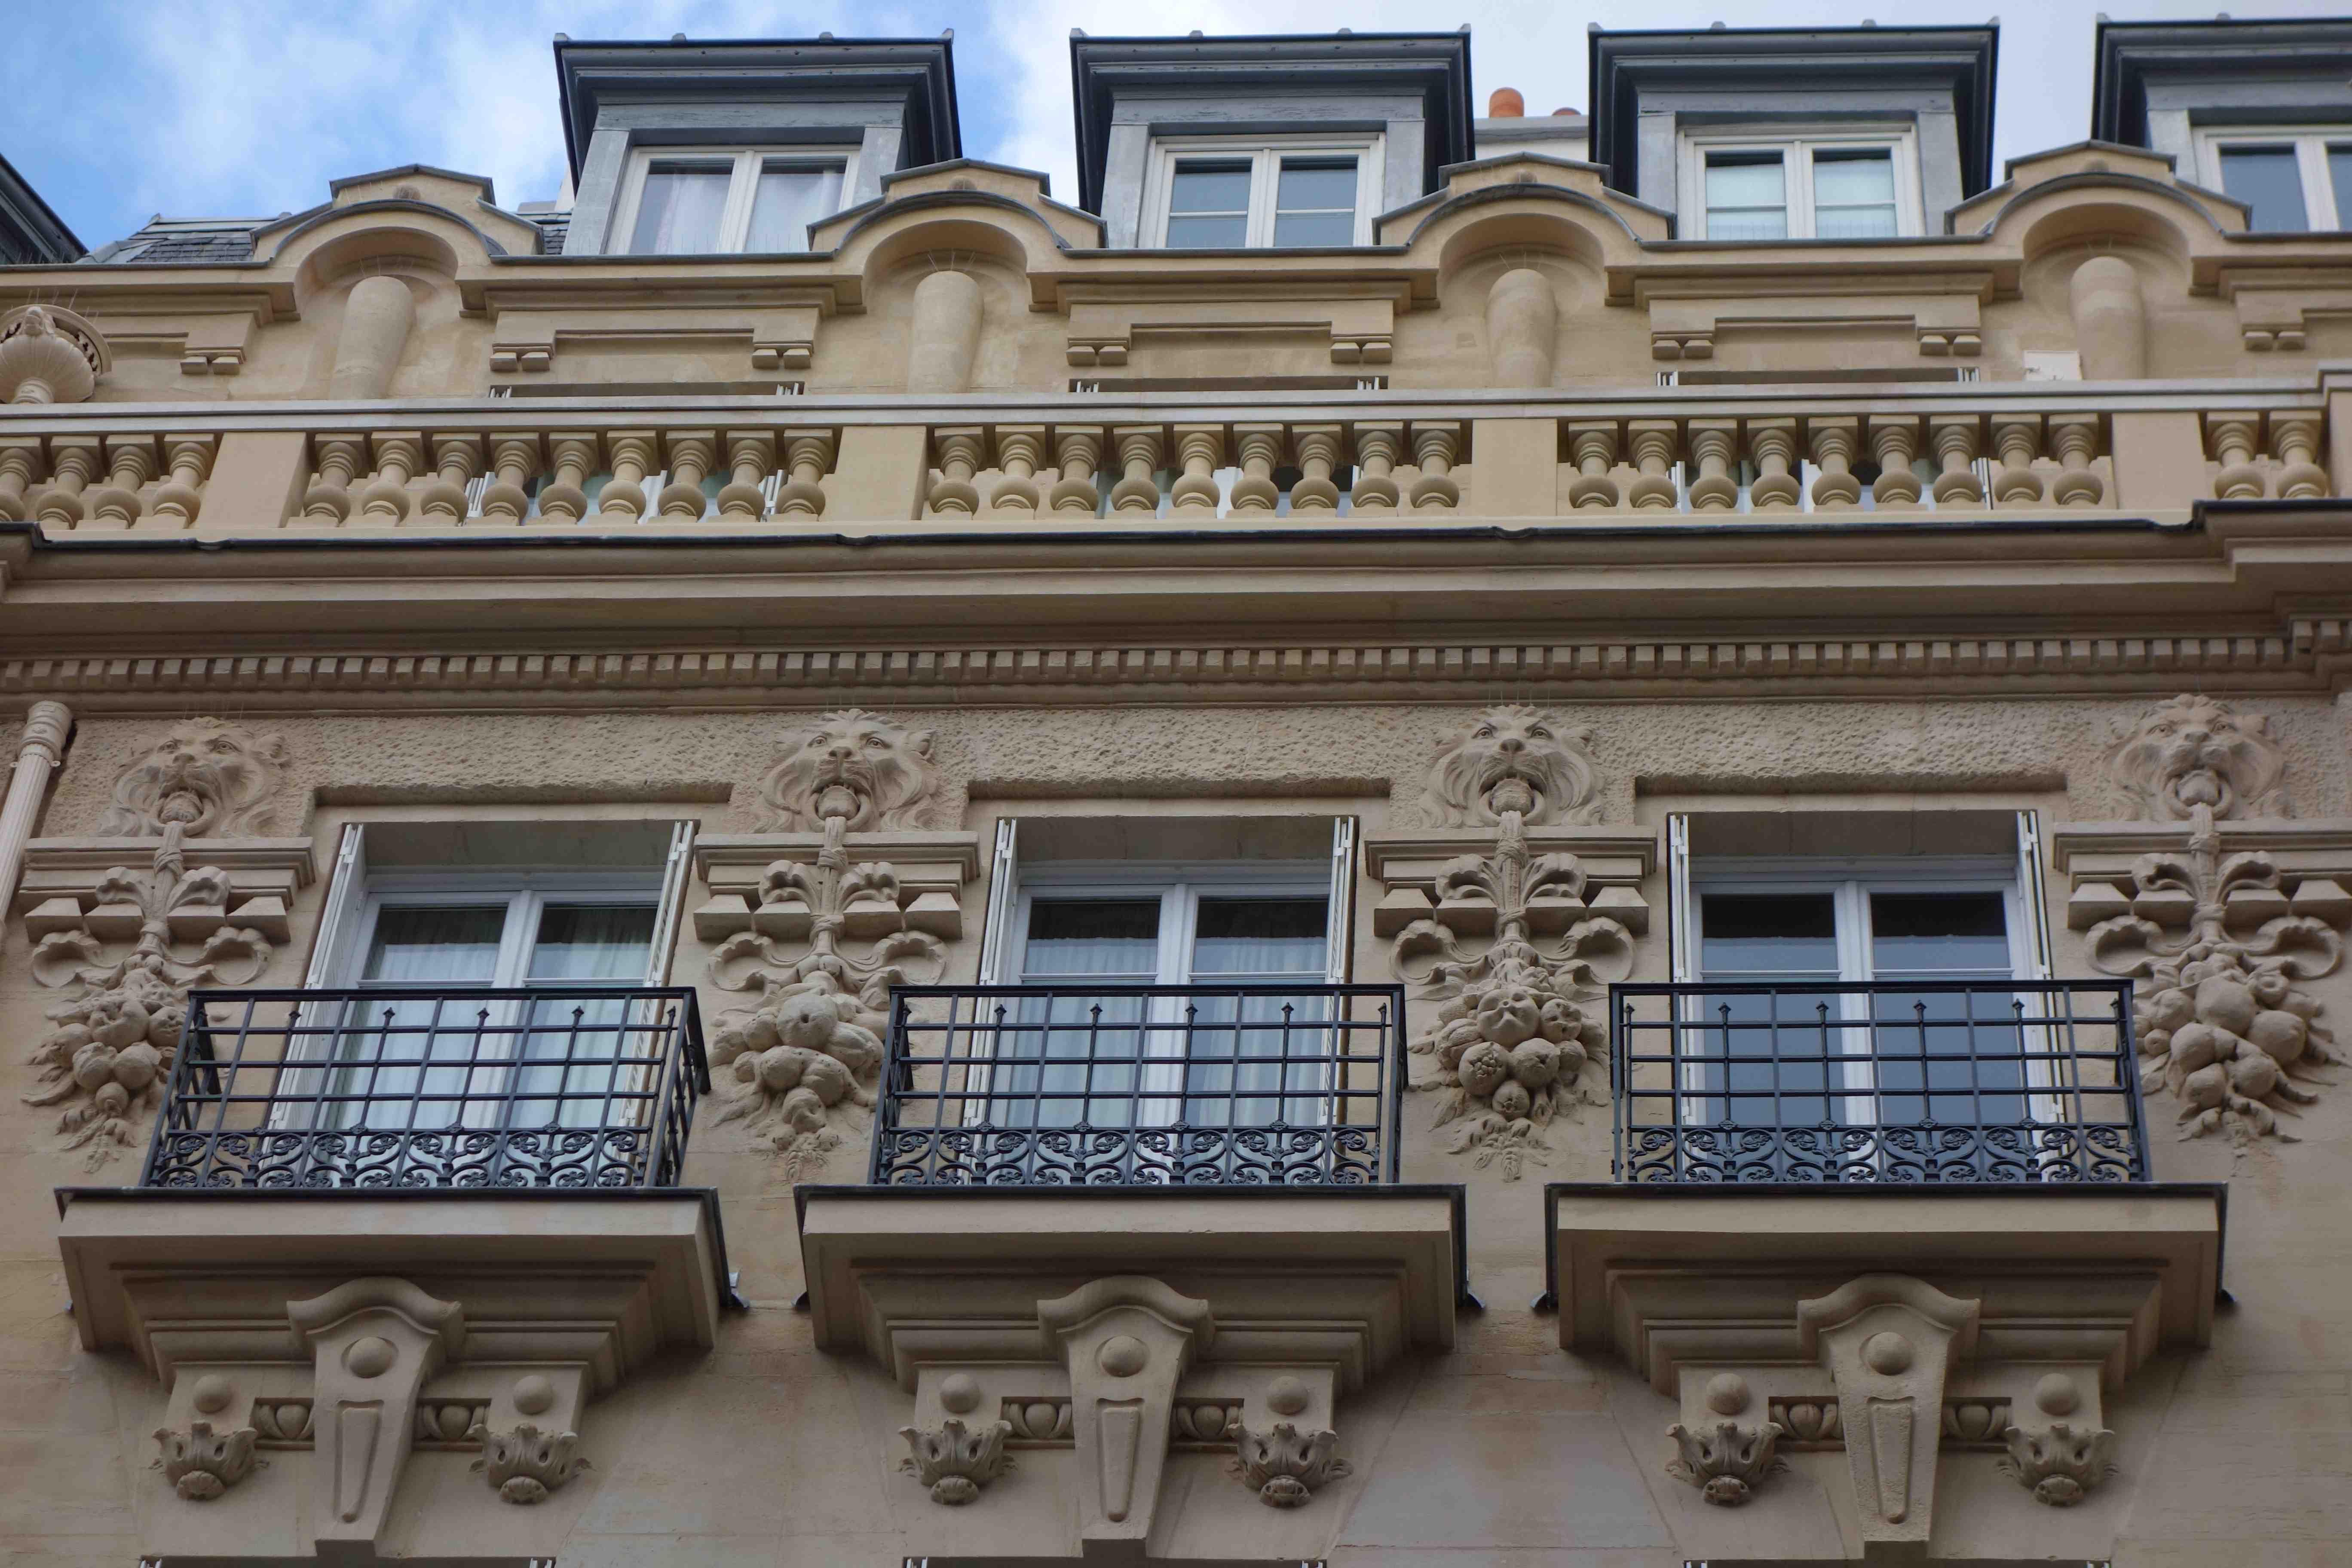 Restauration de fa adeparis x fendler seemuller architectes for Architecte abbeville